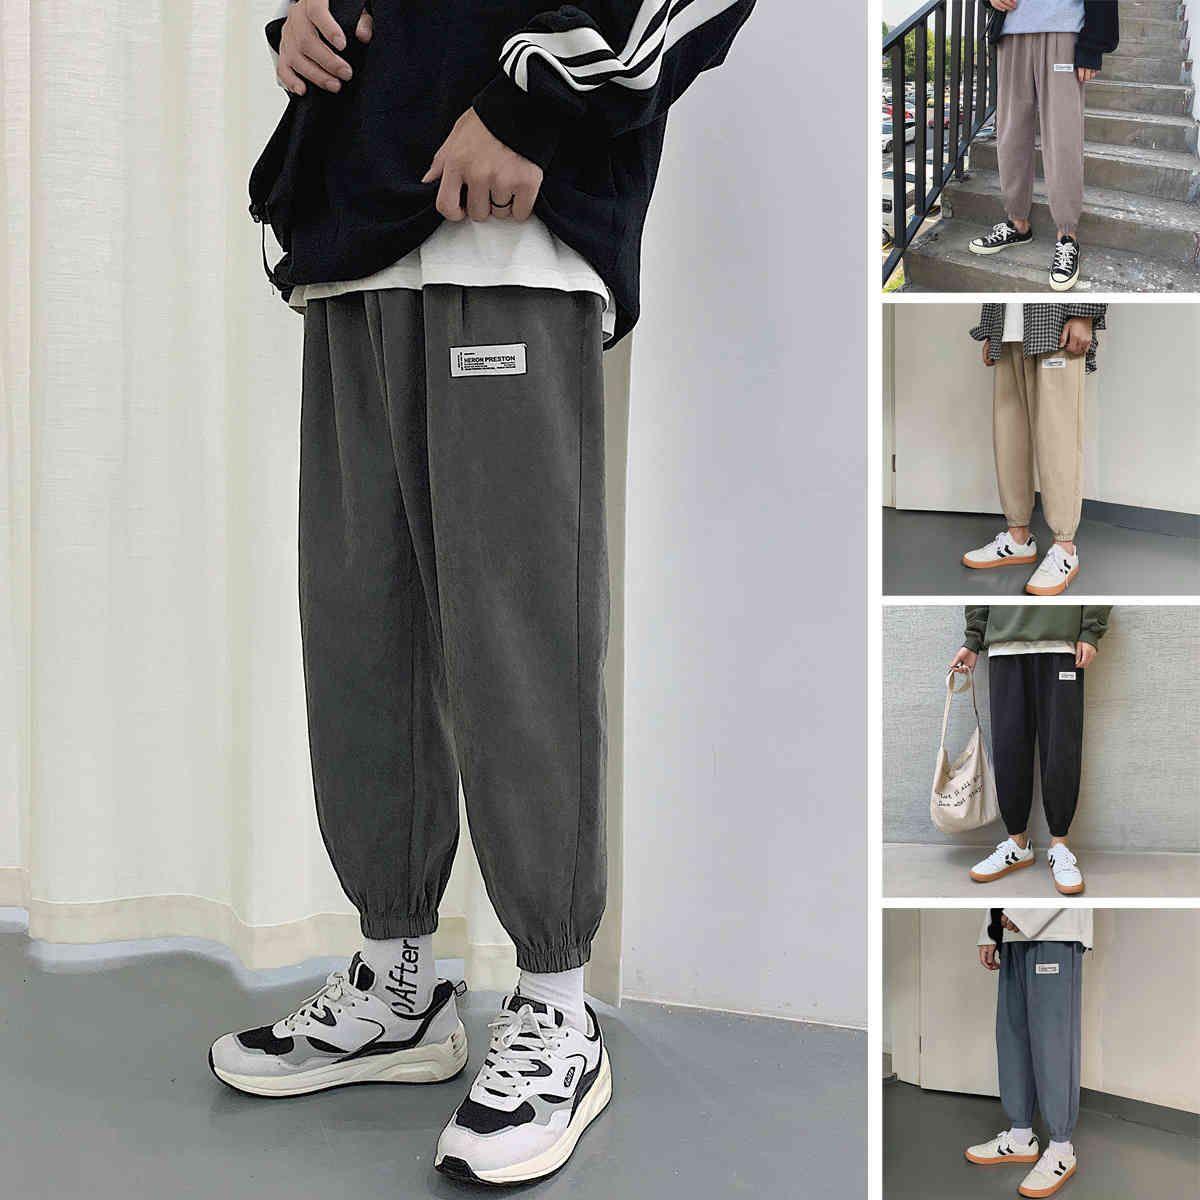 Perth People's 2021 Primavera New Hombres Pequeños Pequeños Pantalones Casuales Poder Pied Piedged Harem Tendencia Capris